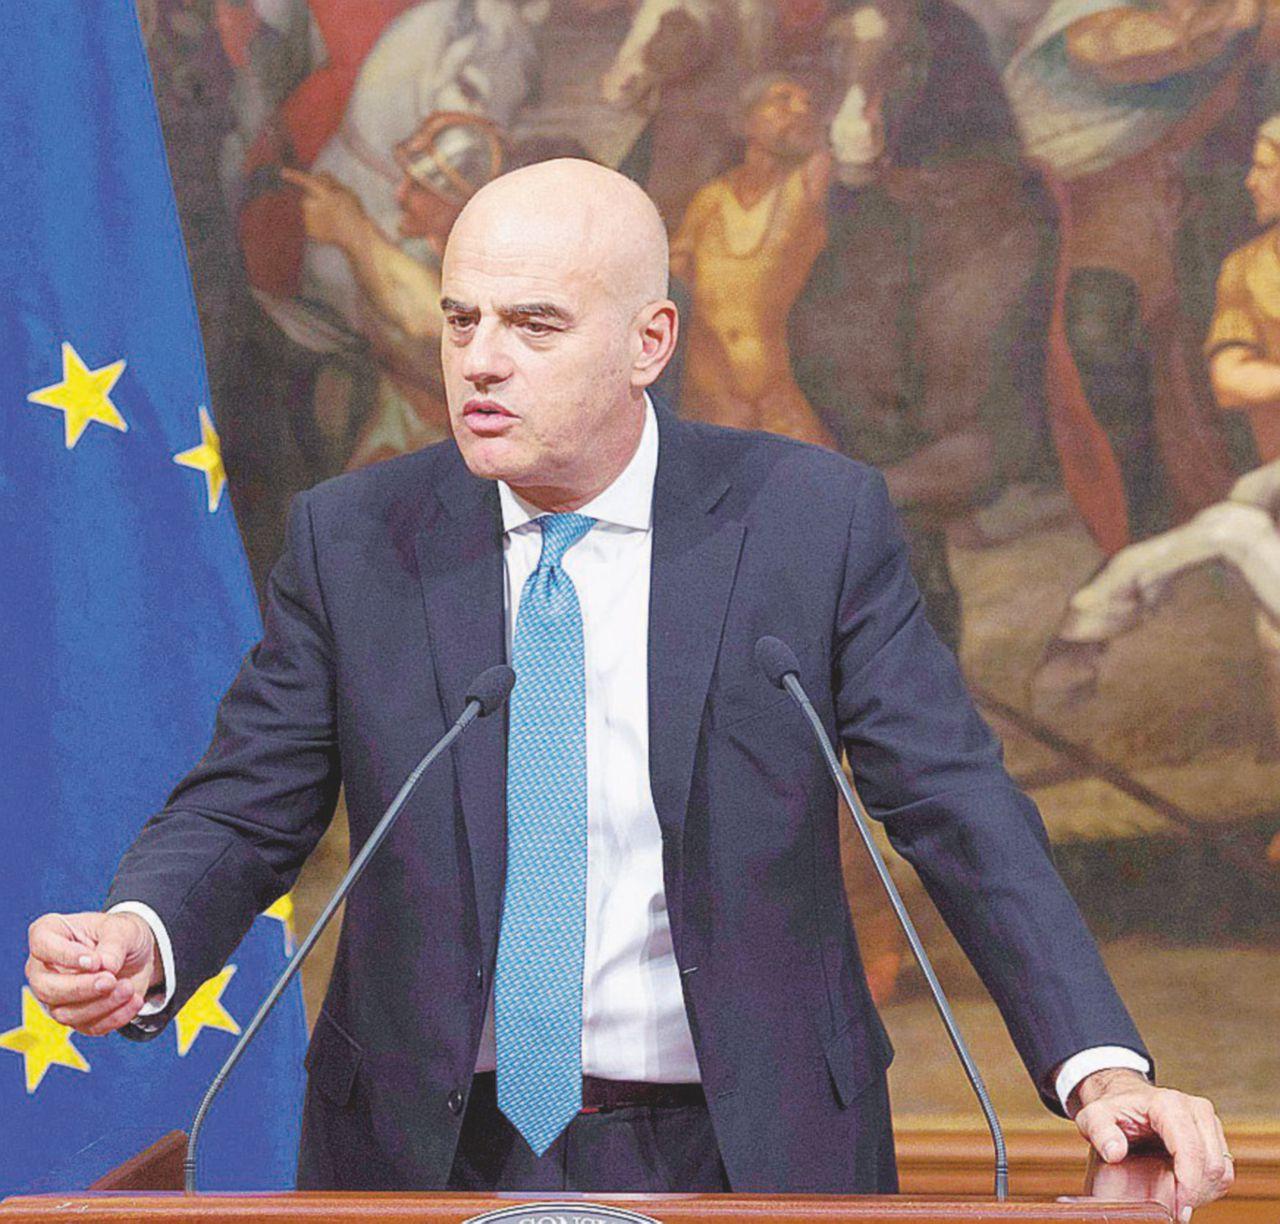 Nomine, trattative notturne in stile Prima Repubblica